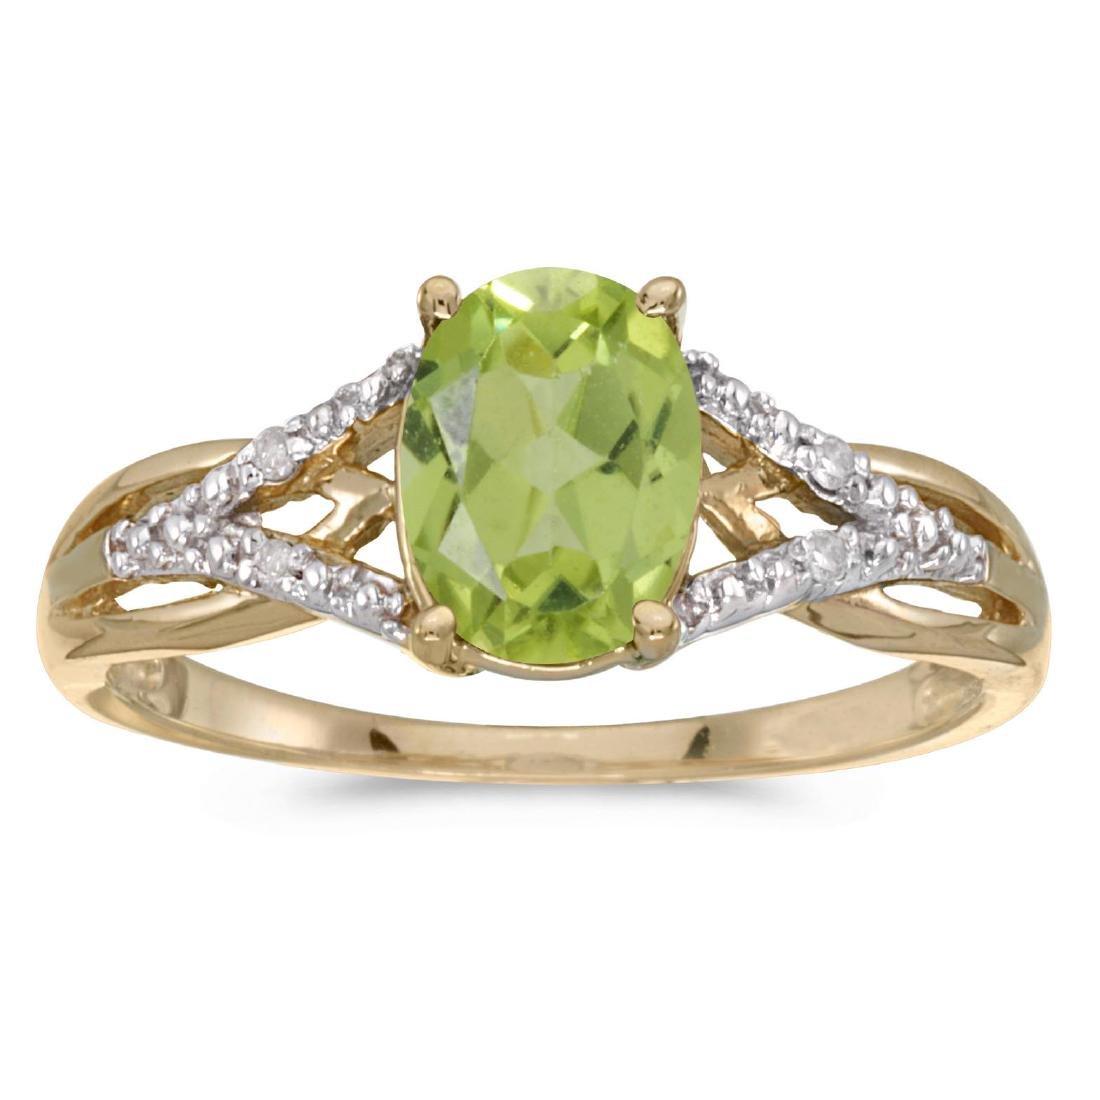 Certified 10k Yellow Gold Oval Peridot And Diamond Ring